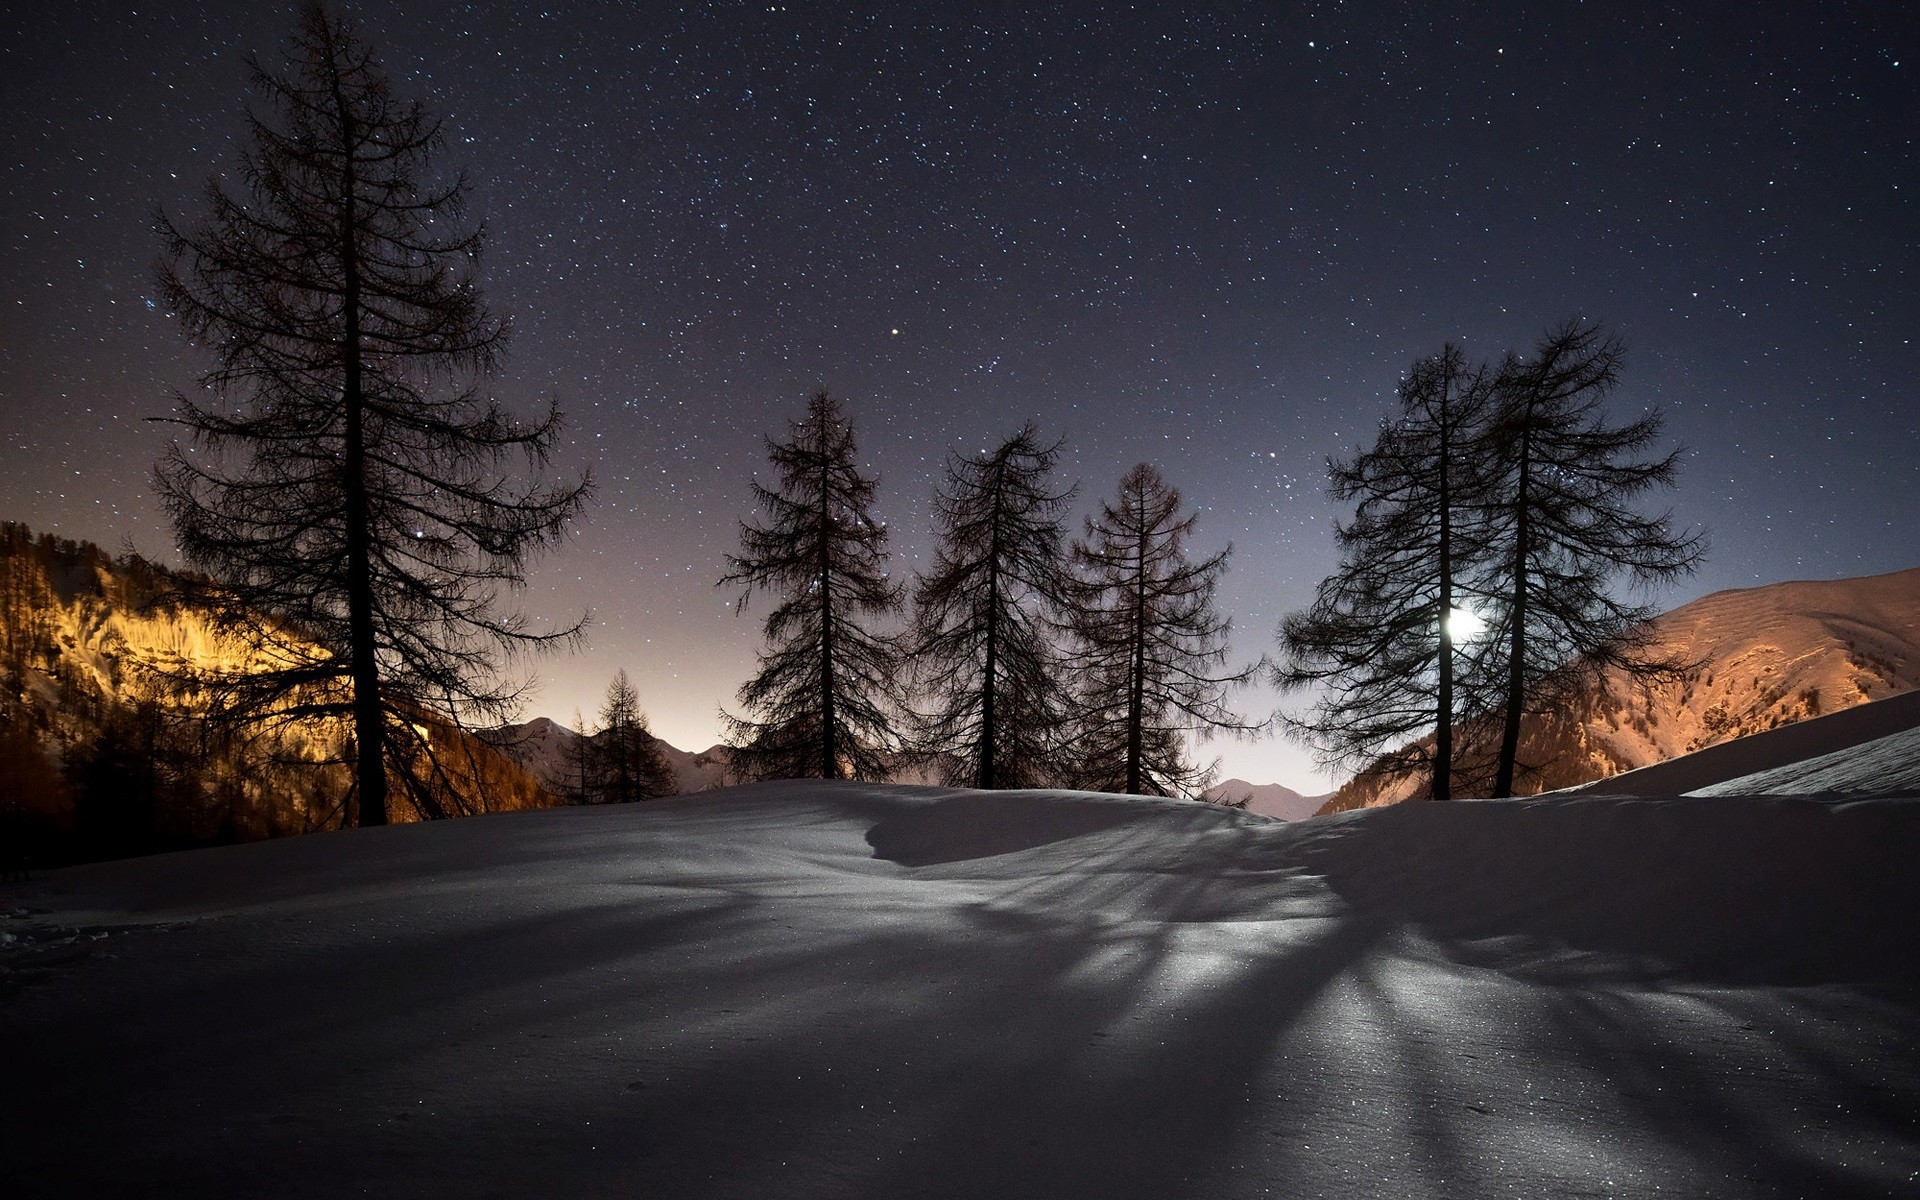 Night, winter, snow, mountains, trees, stars, nature landscape wallpaper  thumb